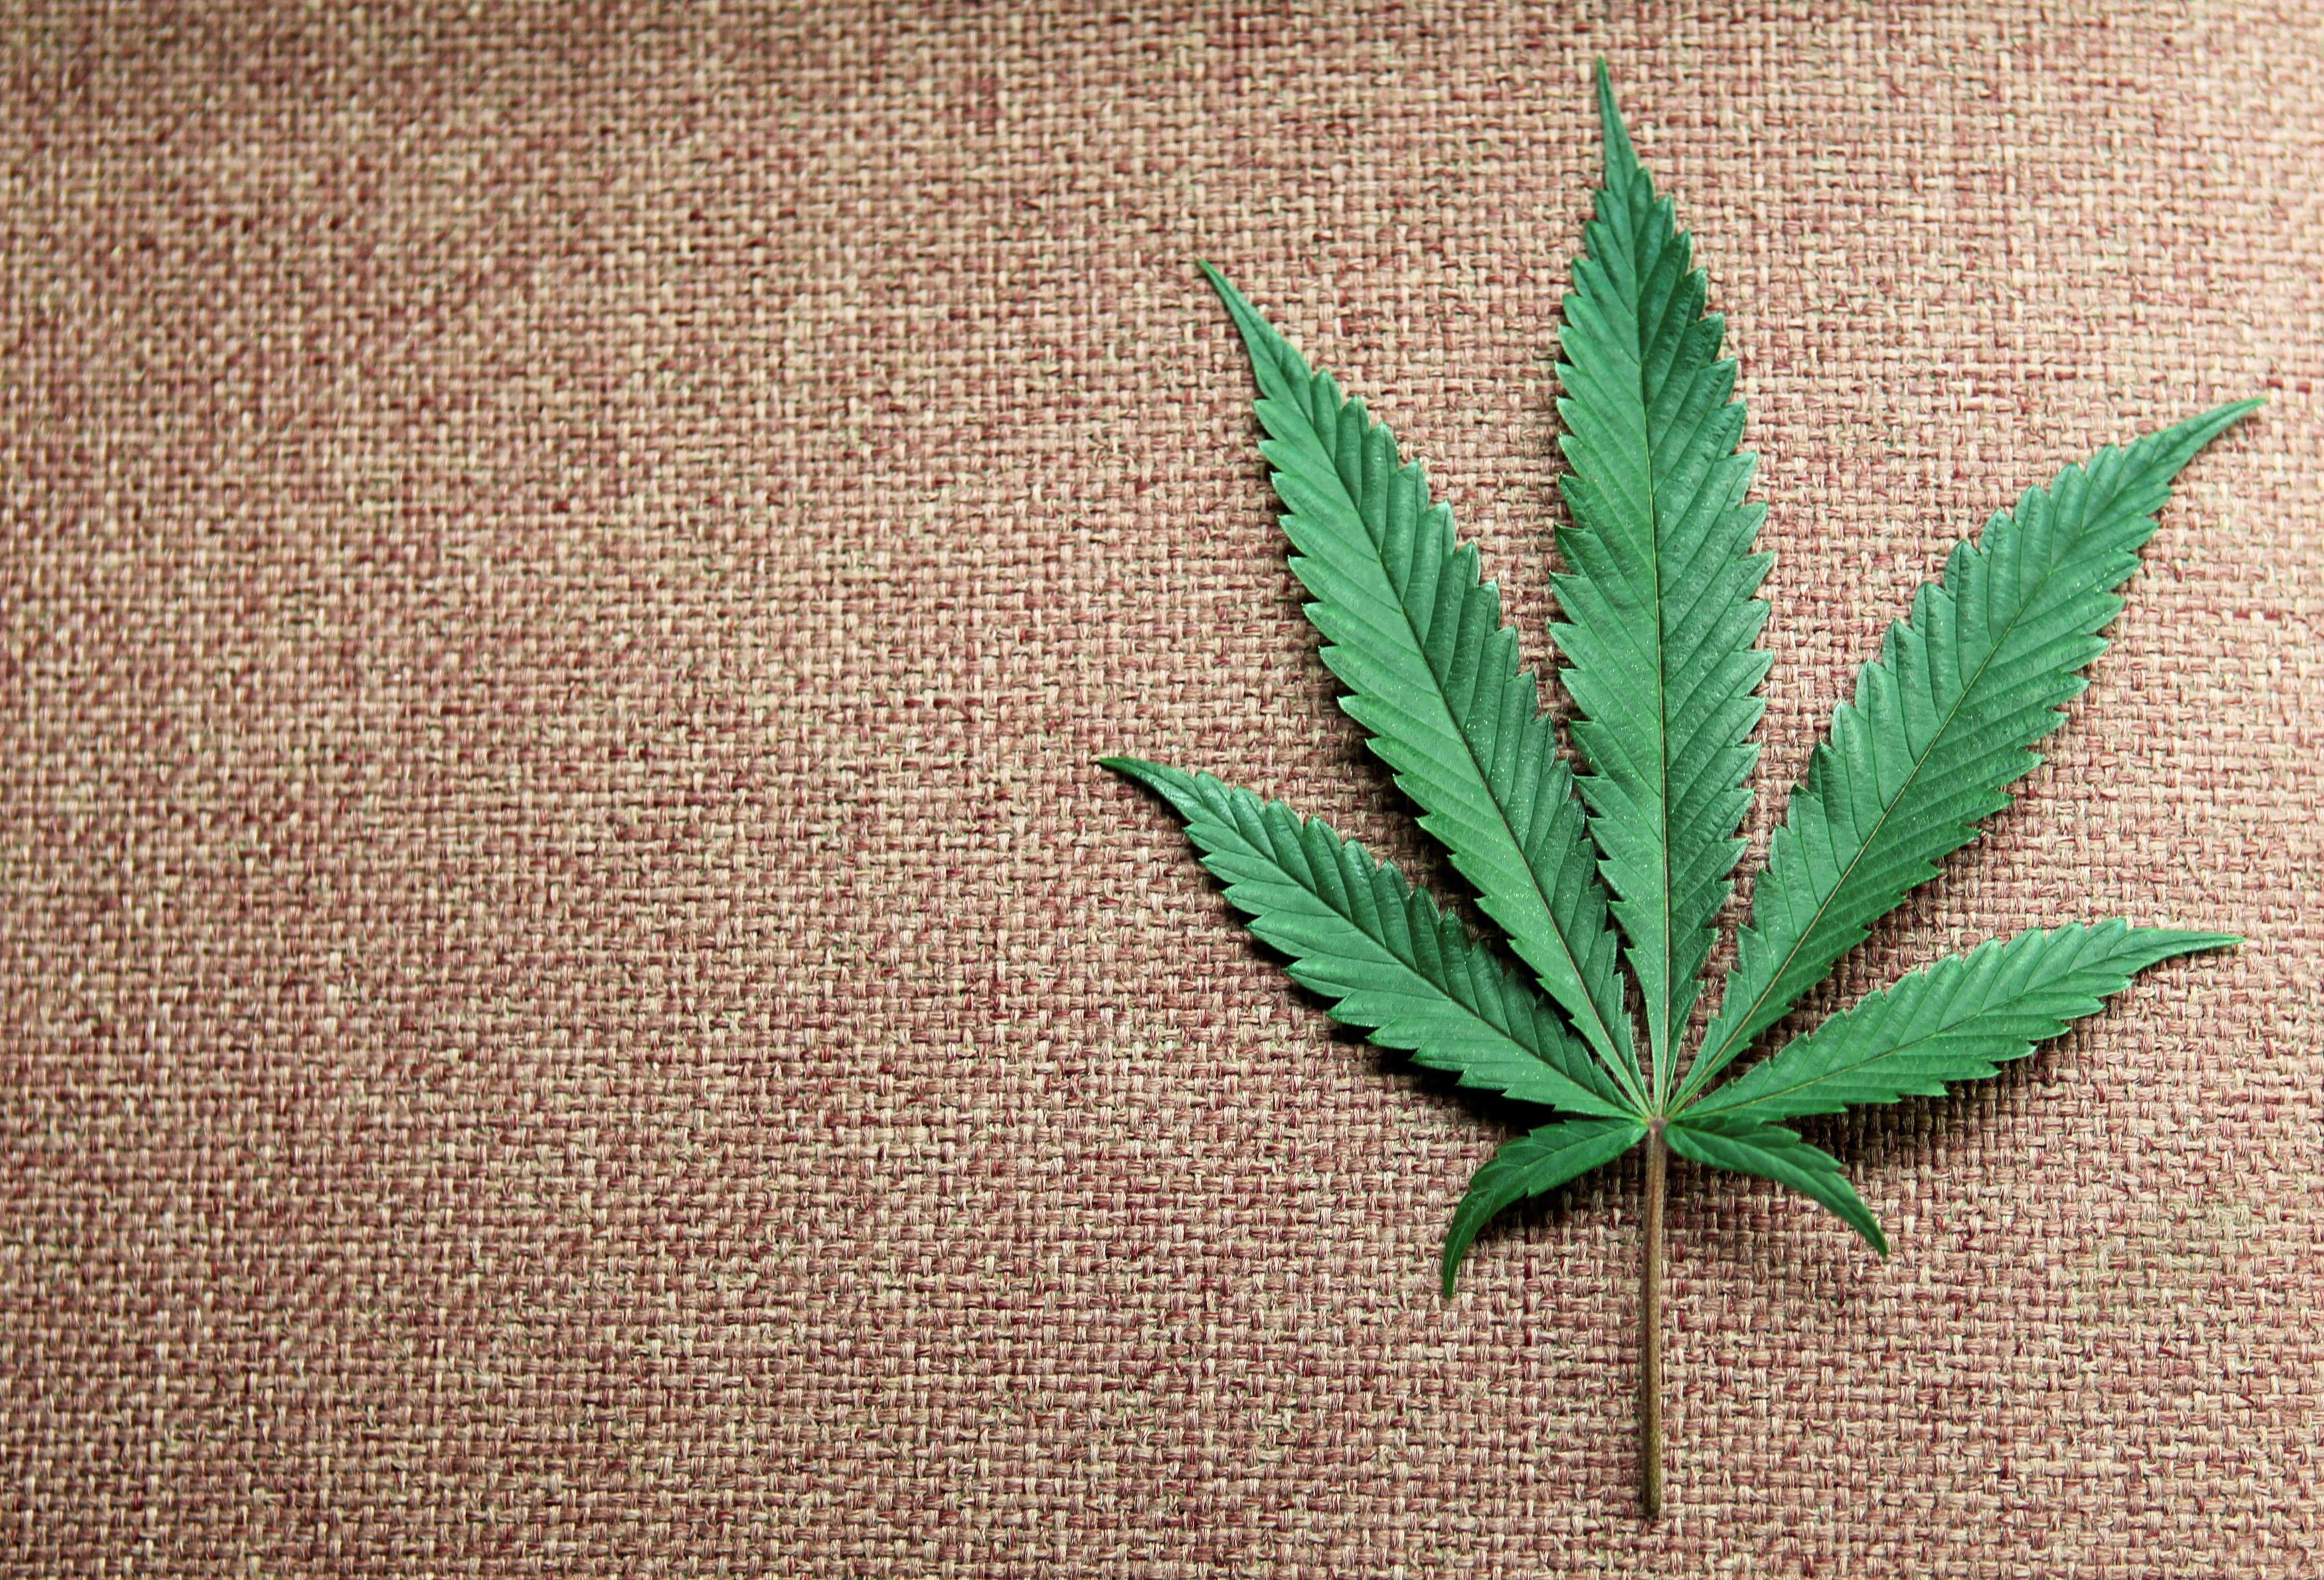 A marijuana leaf is displayed at Canna Pi medical marijuana dispensary in Seattle, Washington, November 27, 2012.   REUTERS/Anthony Bolante